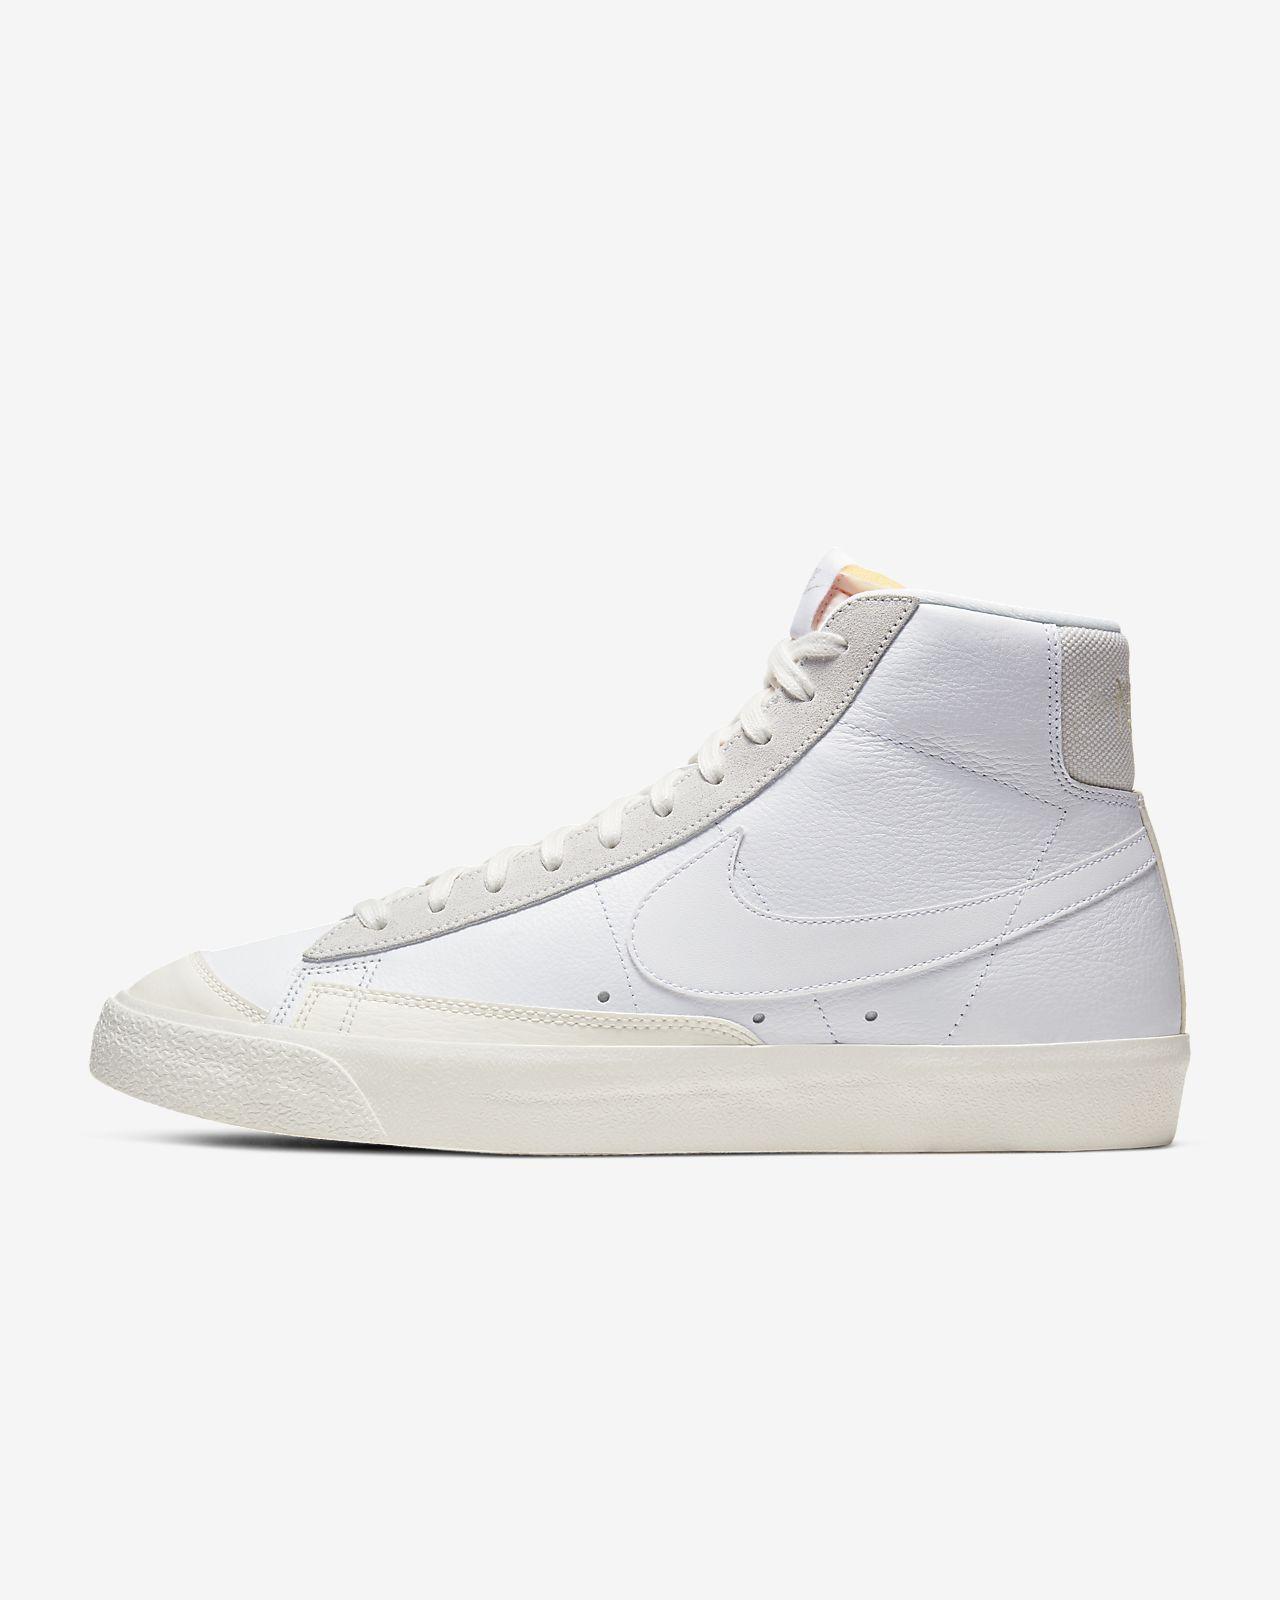 Nike Blazer Mid Vintage '77 Men's Shoe